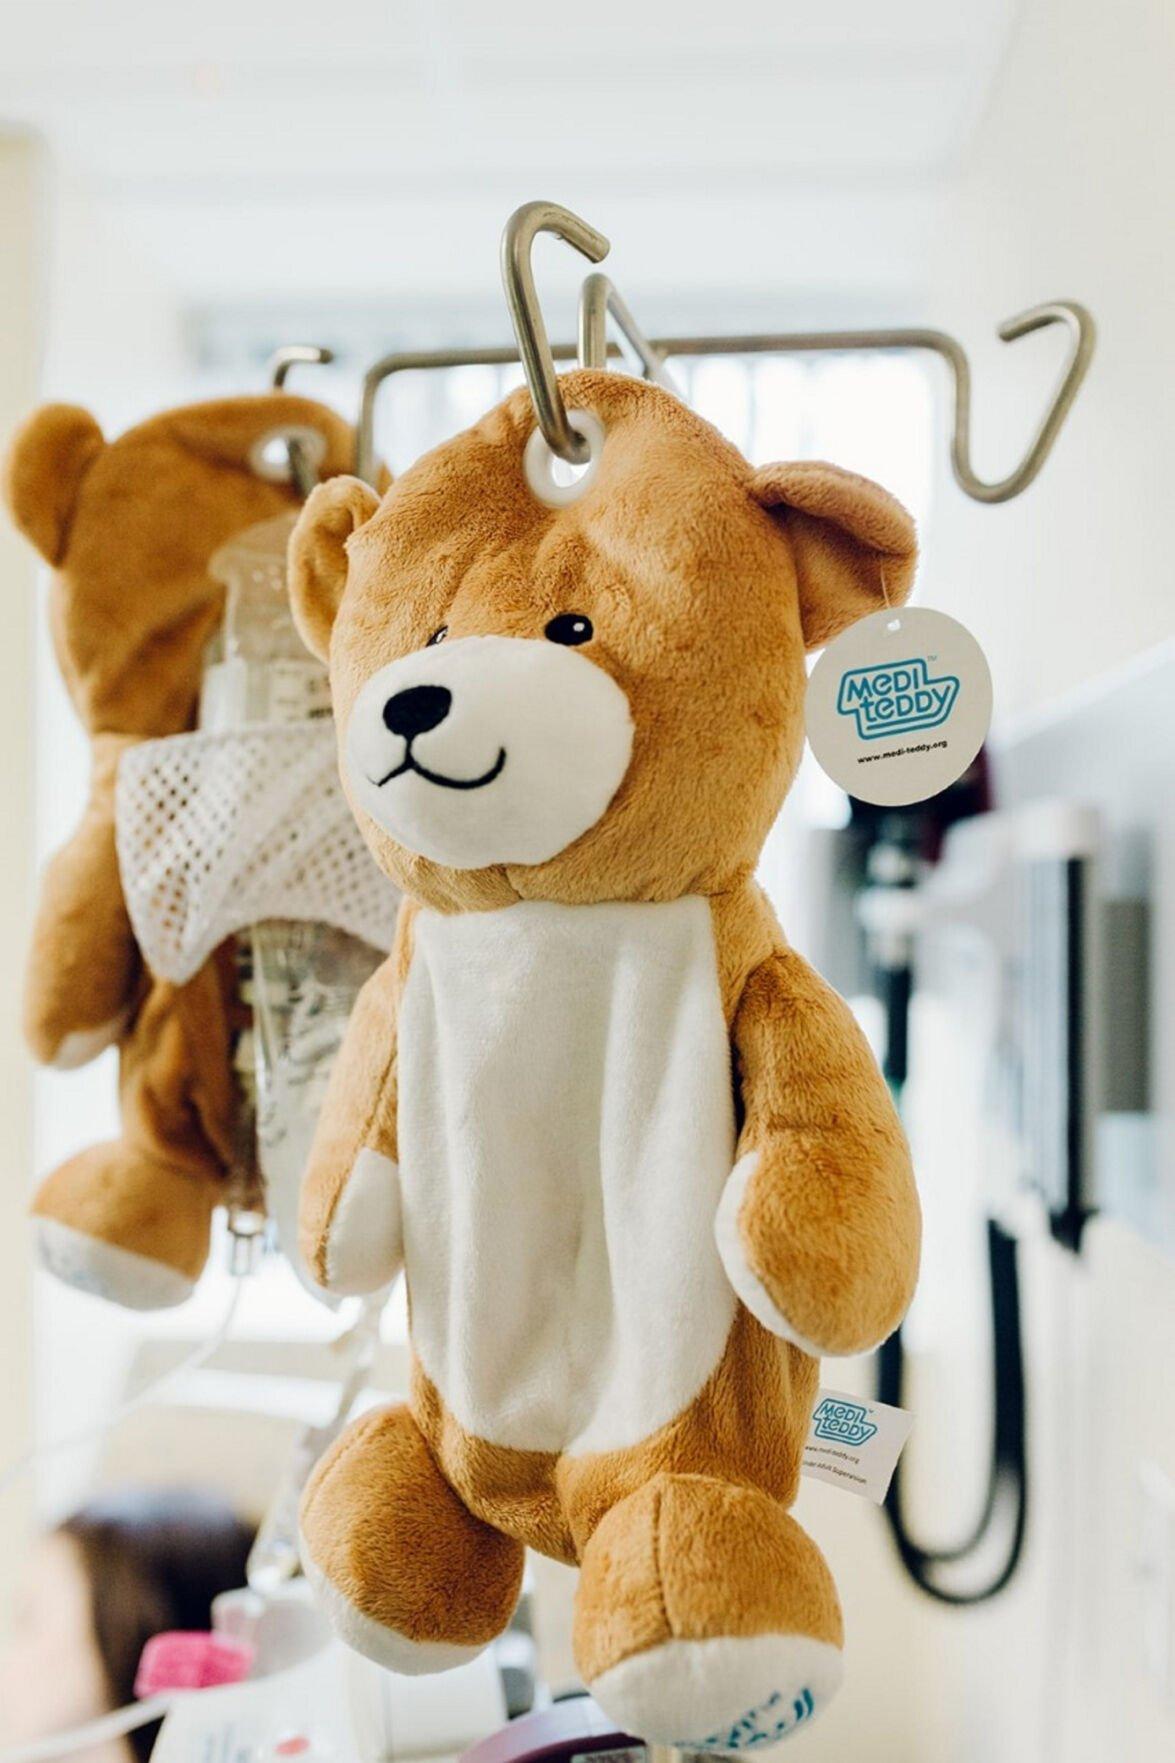 Medi Teddys a comfort to pediatric patients